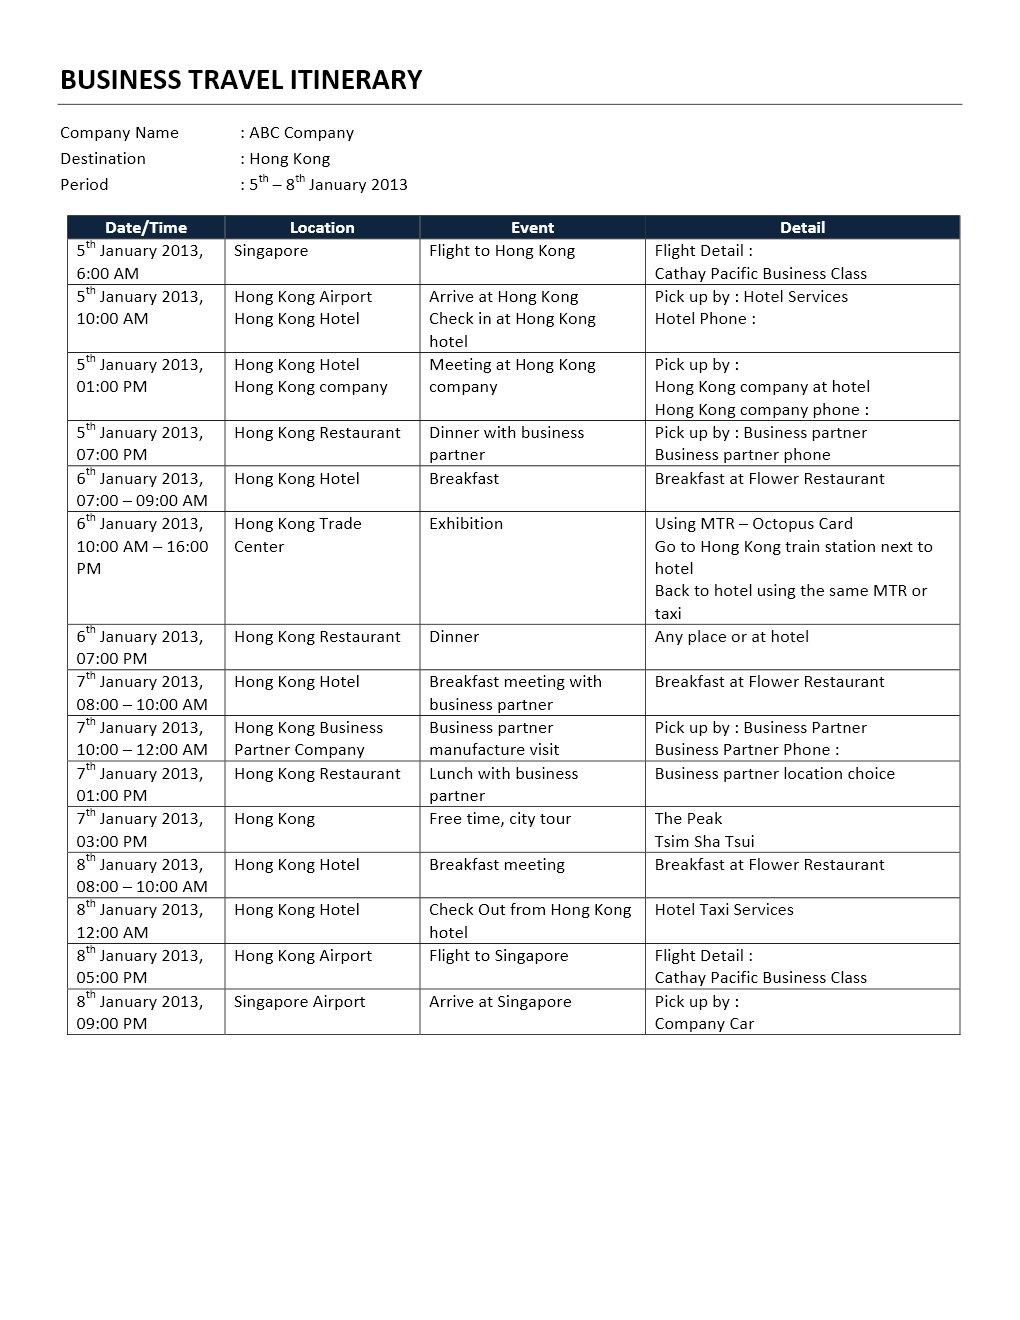 Microsoft Travel Itinerary Template